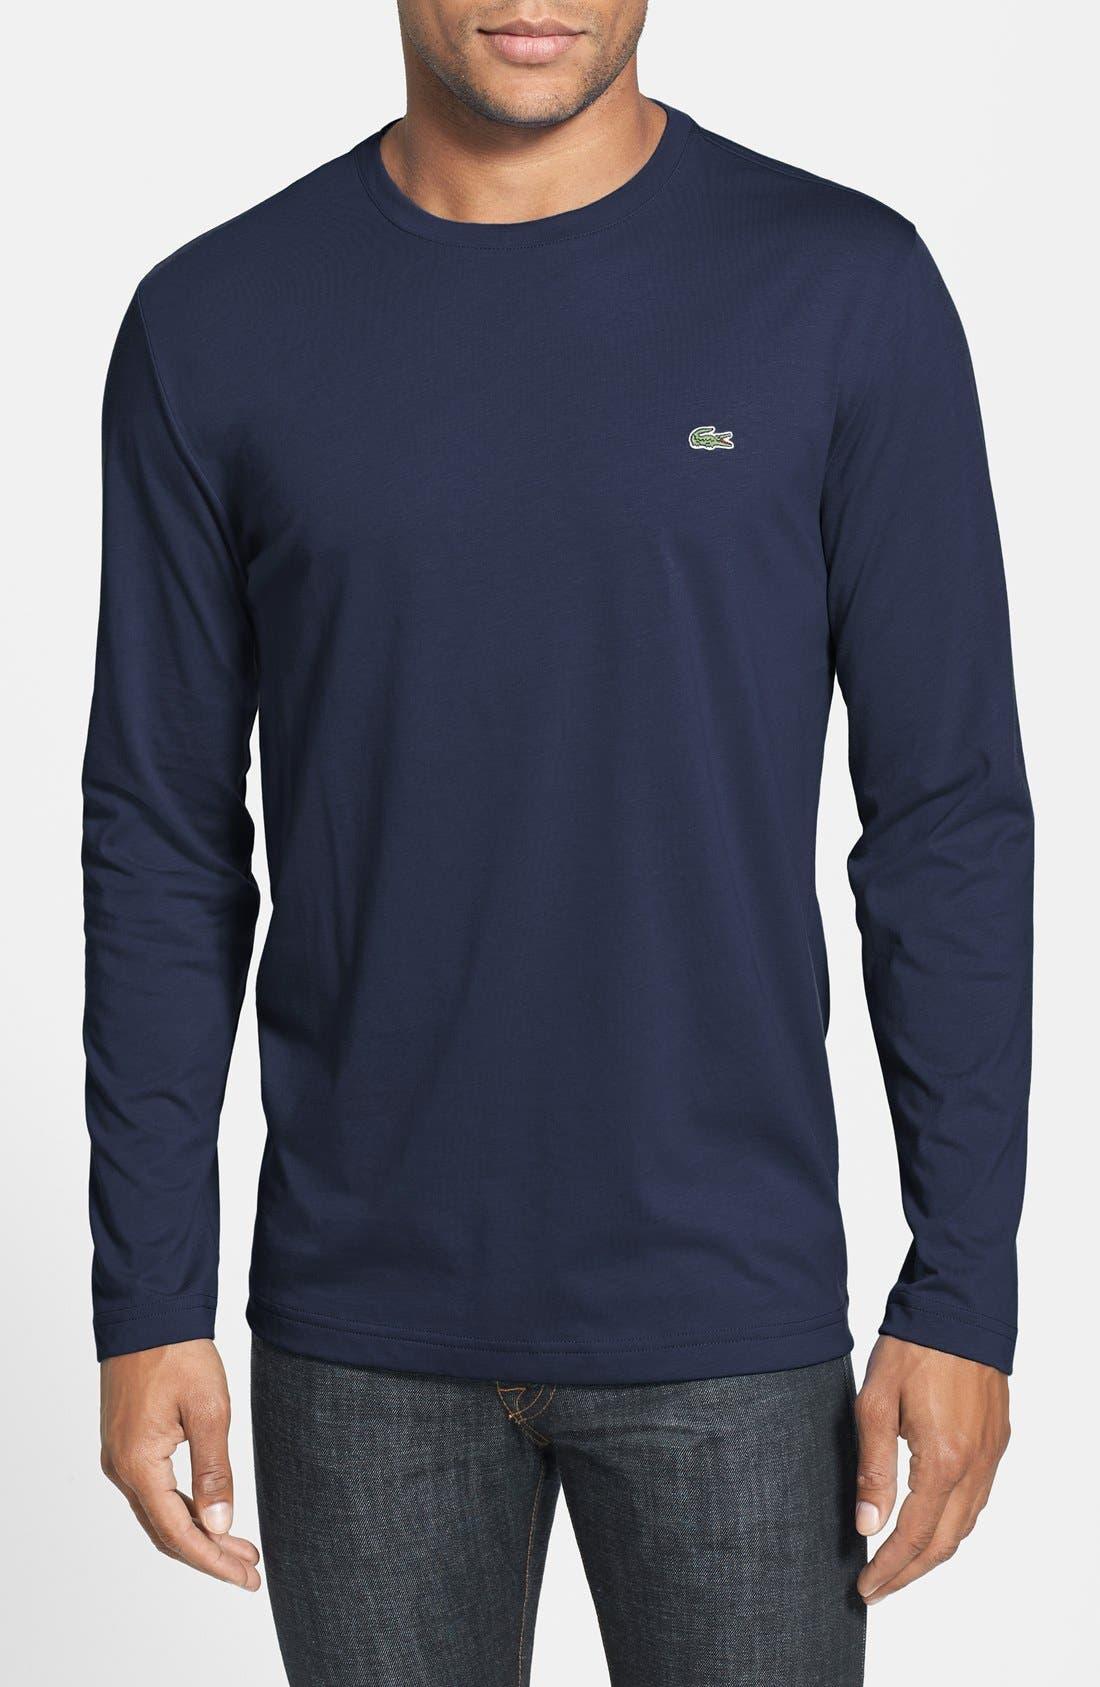 Main Image - Lacoste Long Sleeve Pima Cotton T-Shirt